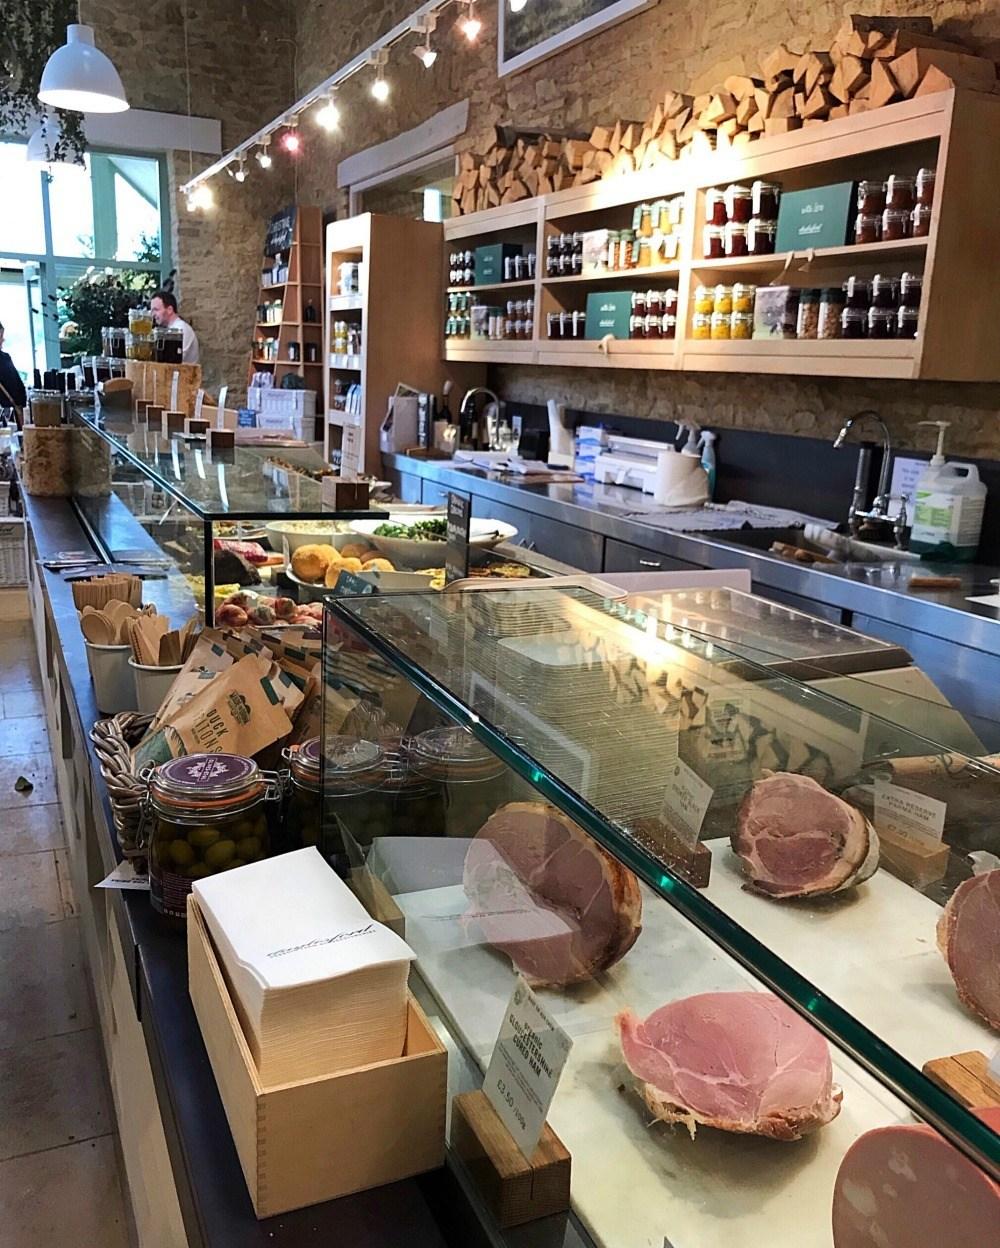 Daylesford Organics - Michael Paul Holidays - Bruern Cottages - Photo Heatheronhertravels.com